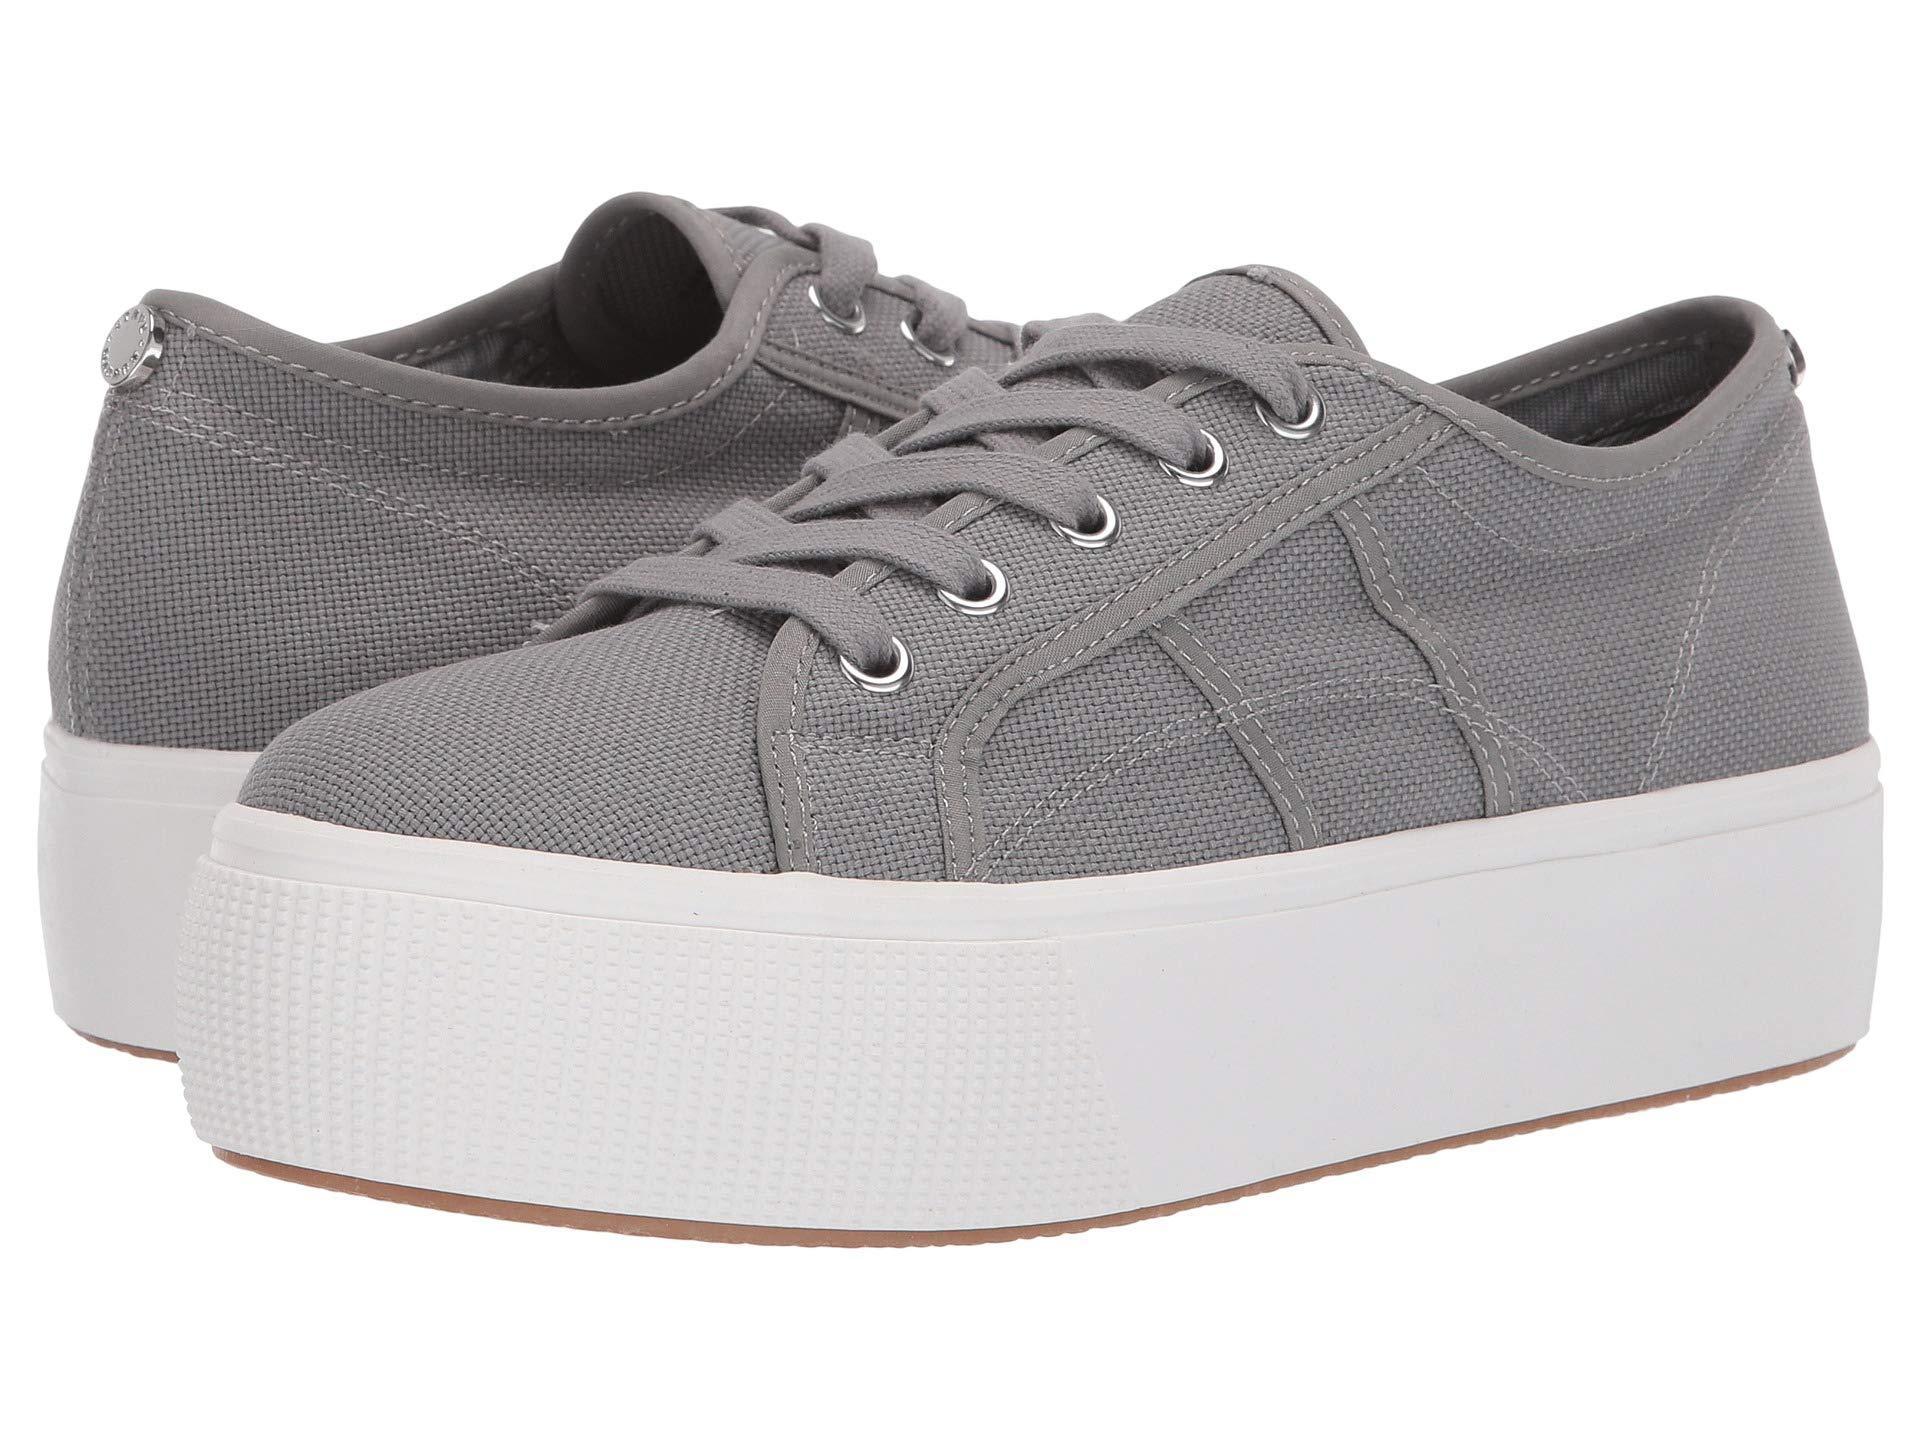 d0139dda2ed Lyst - Steve Madden Emmi Platform Sneaker (grey) Women s Shoes in Gray